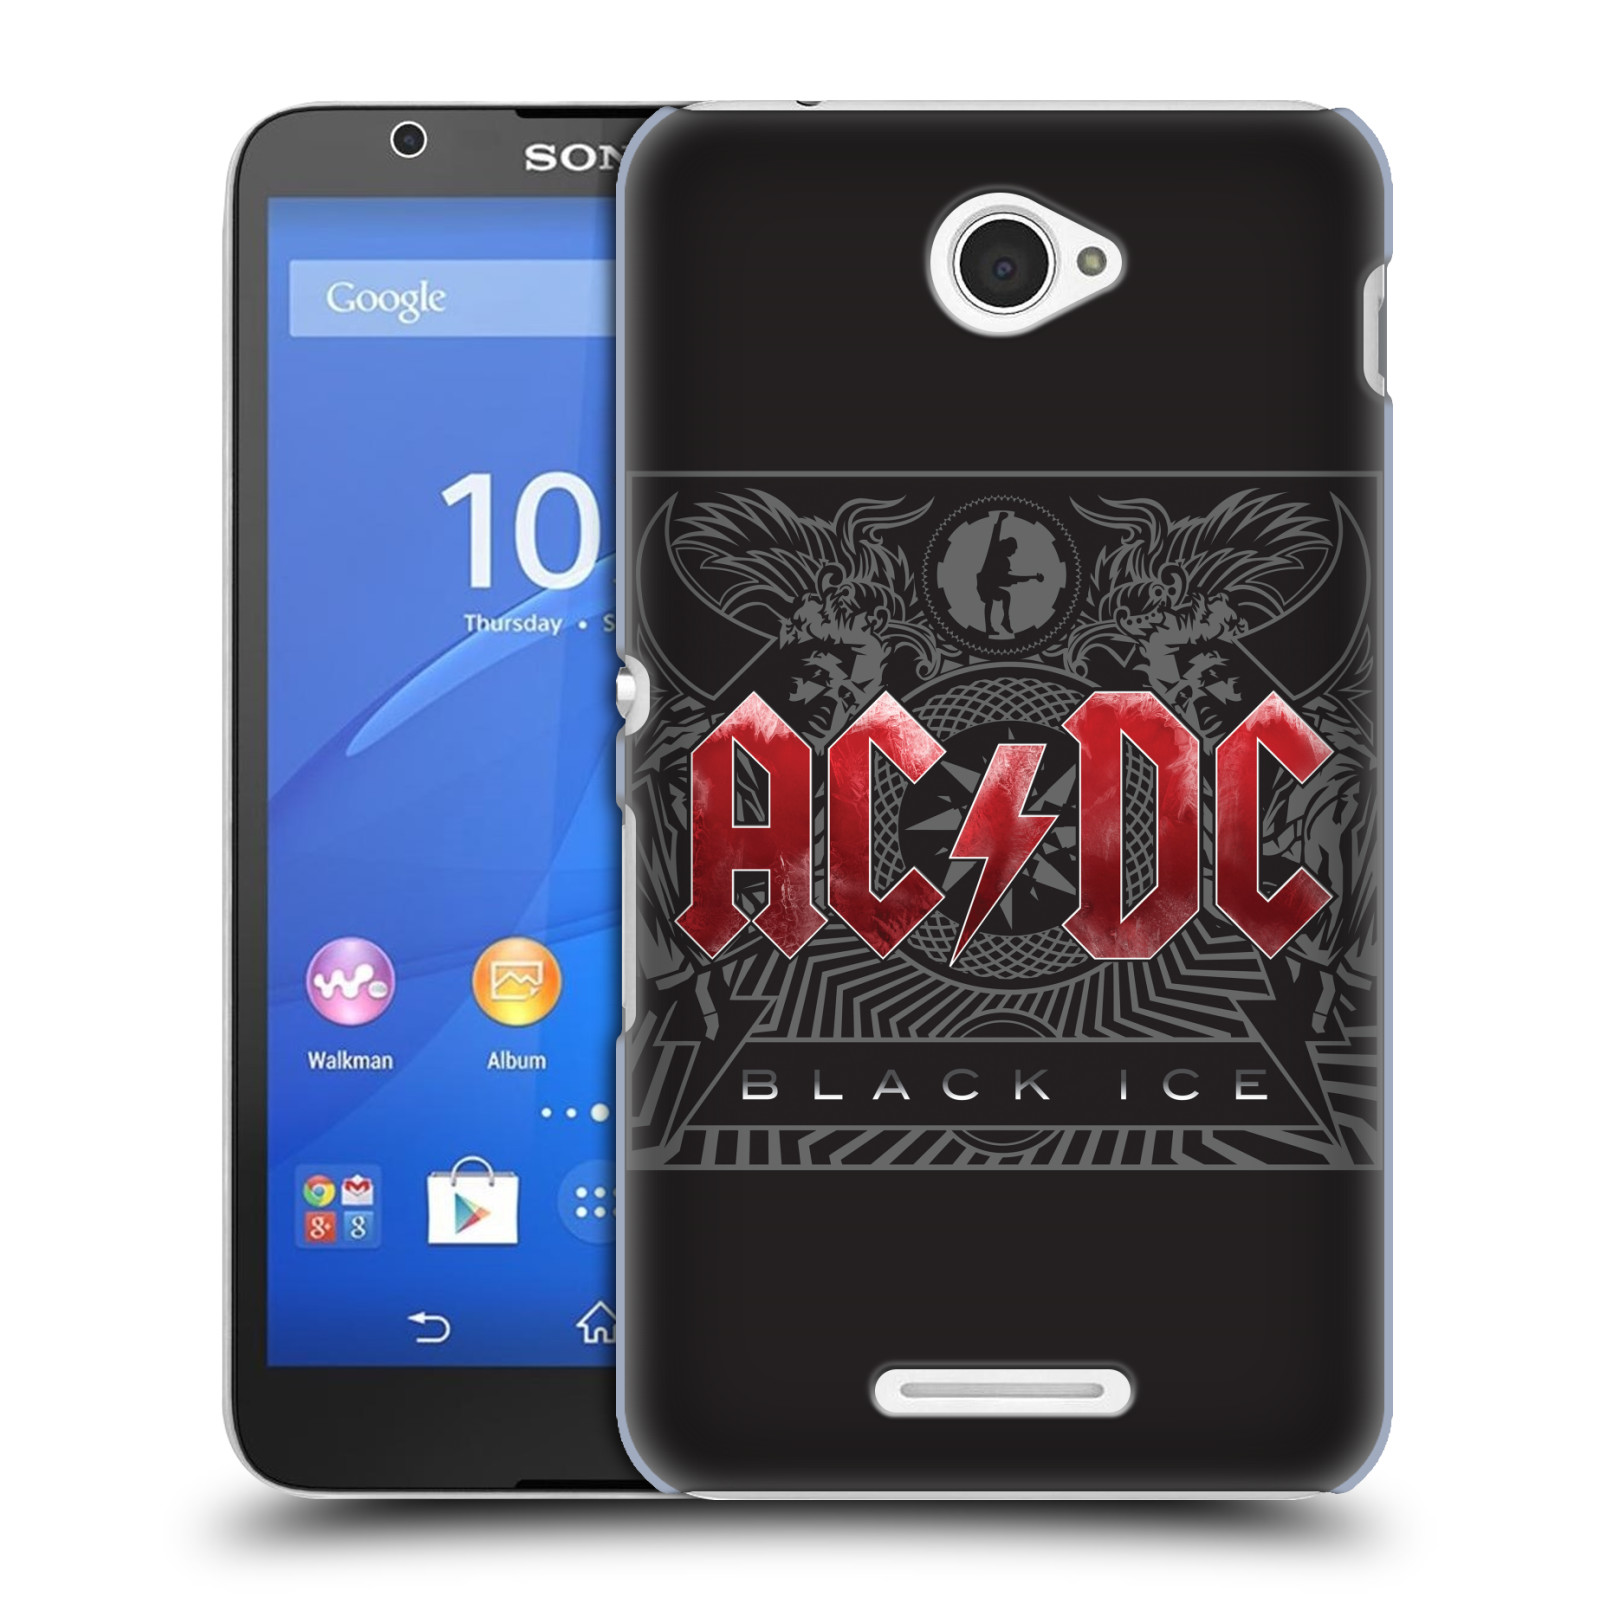 Plastové pouzdro na mobil Sony Xperia E4 E2105 HEAD CASE AC/DC Black Ice (Plastový kryt či obal na mobilní telefon s oficiálním motivem australské skupiny AC/DC pro Sony Xperia E4 a E4 Dual SIM)